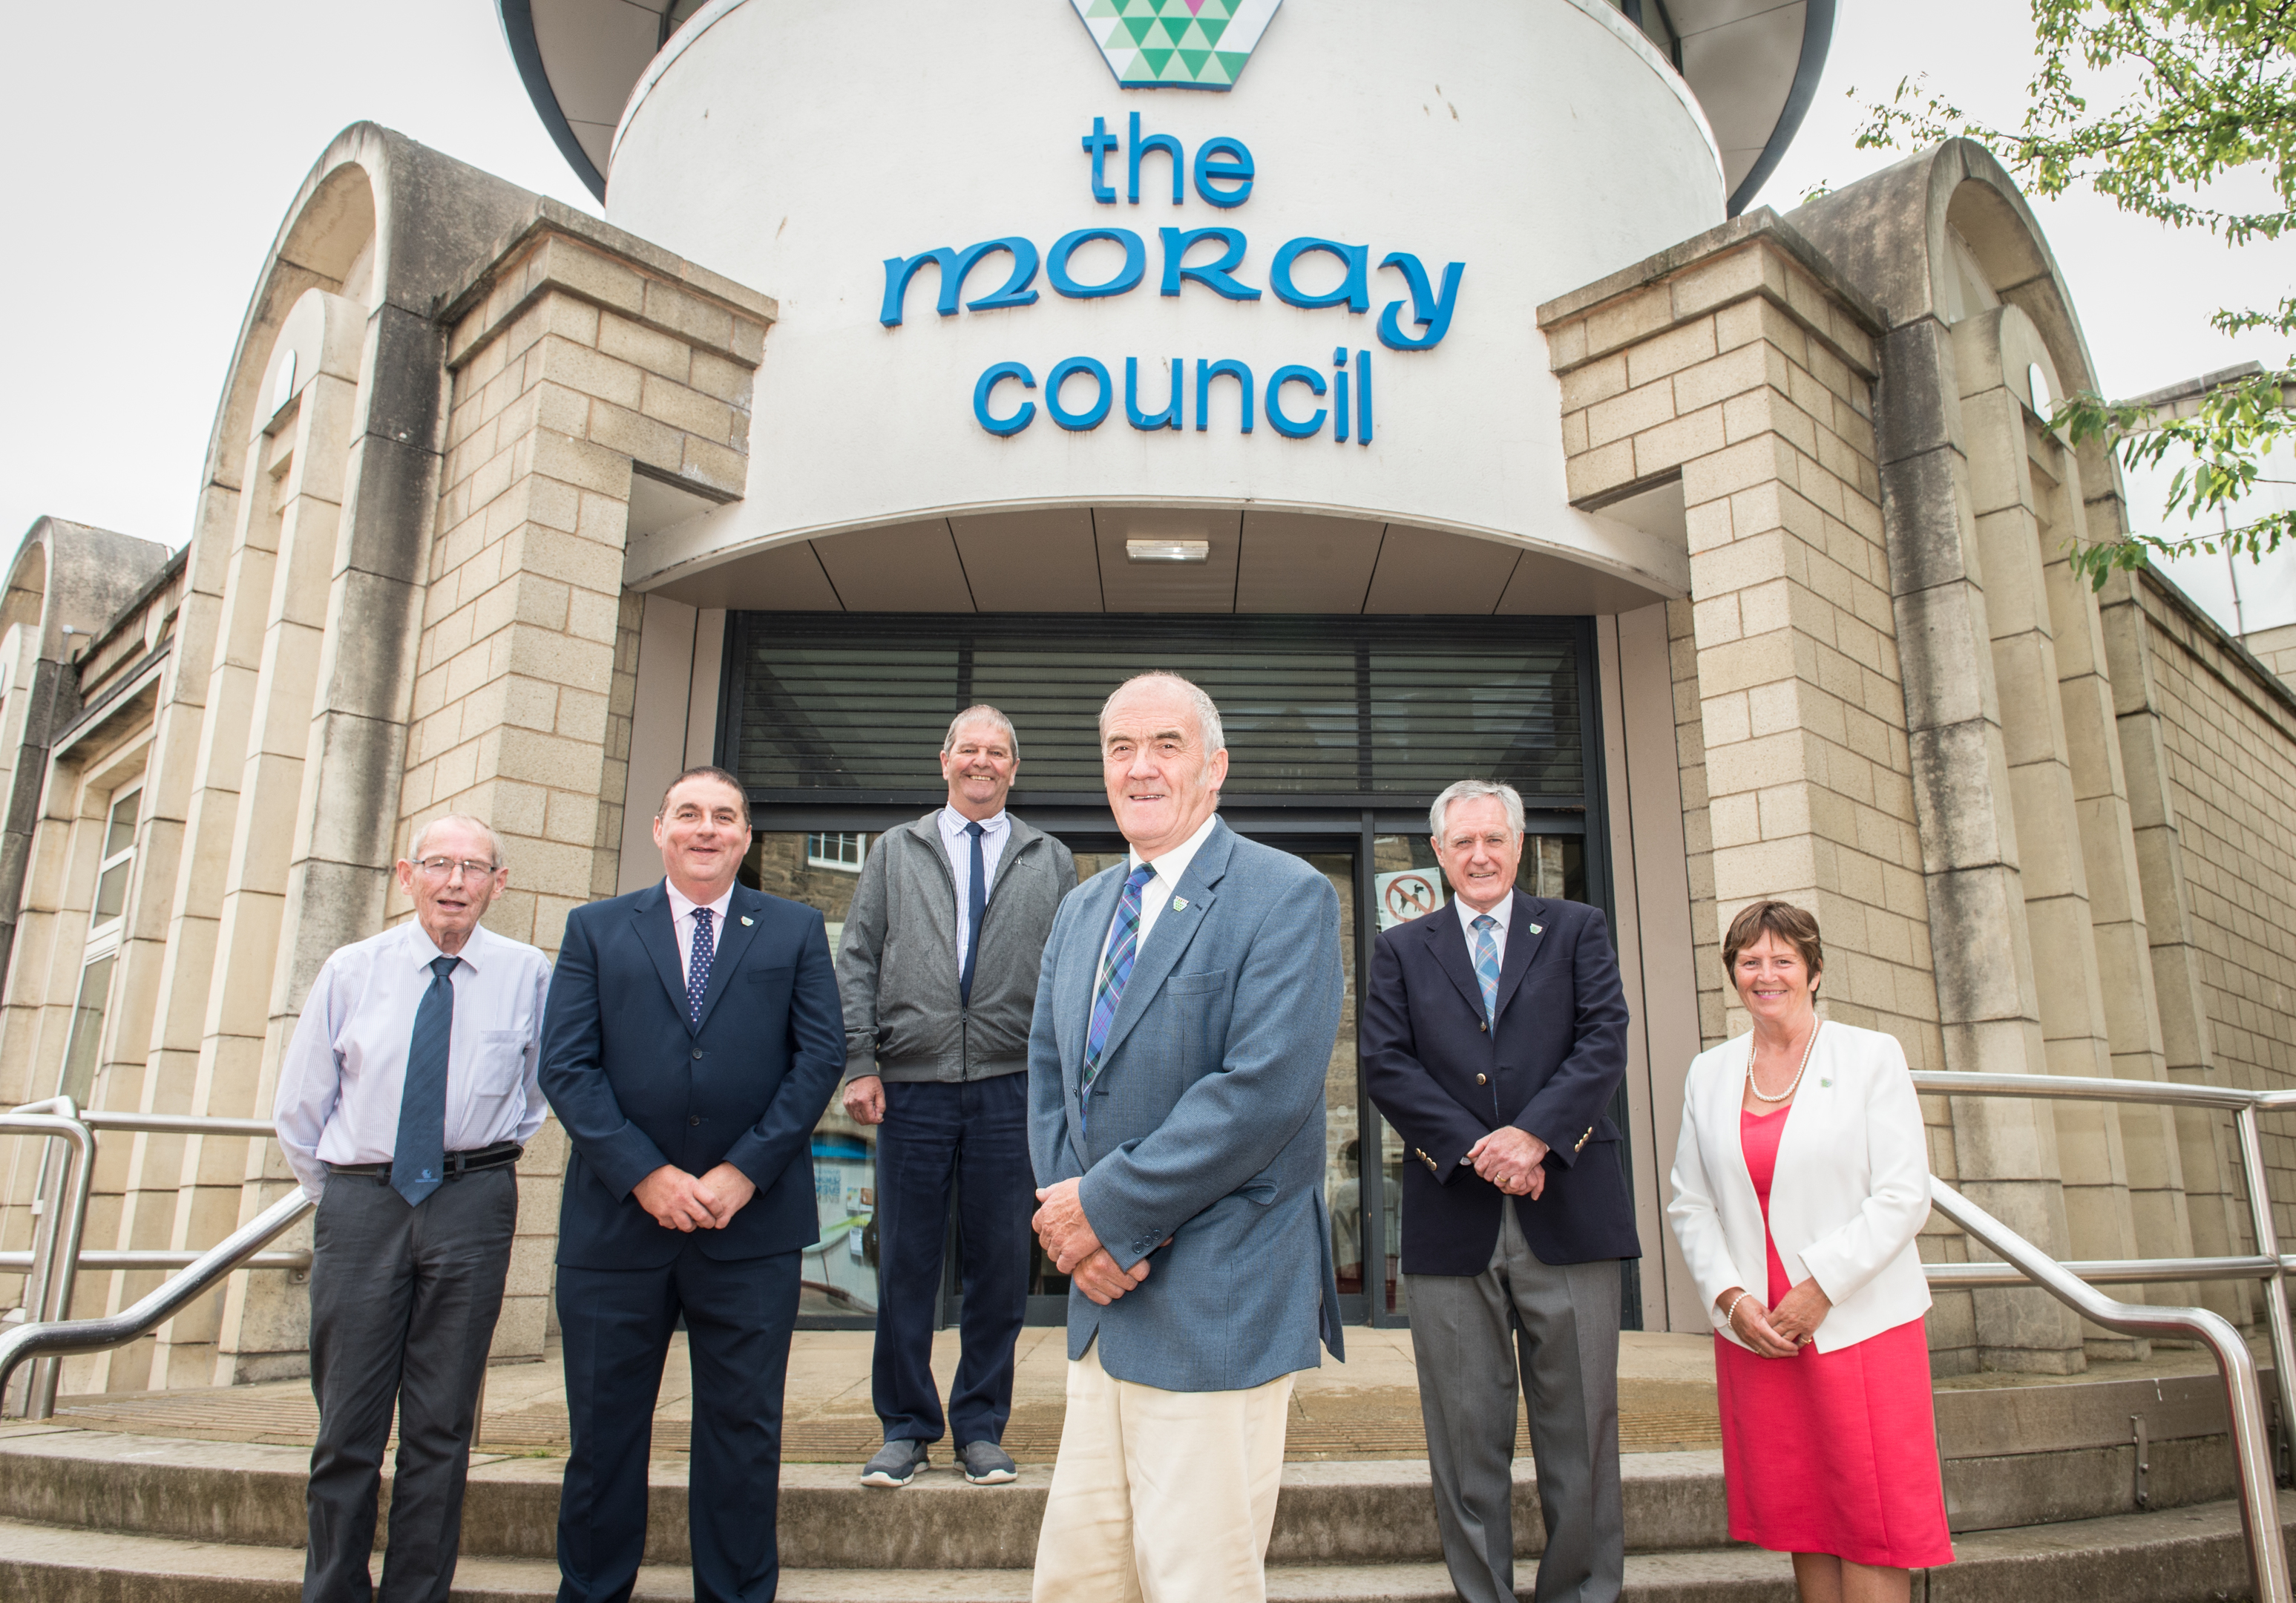 Ronald Shepherd, James Allan, Gordon Cowie George Alexander (Lead Councillor of the Group), John Cowe, Lorna Creswell